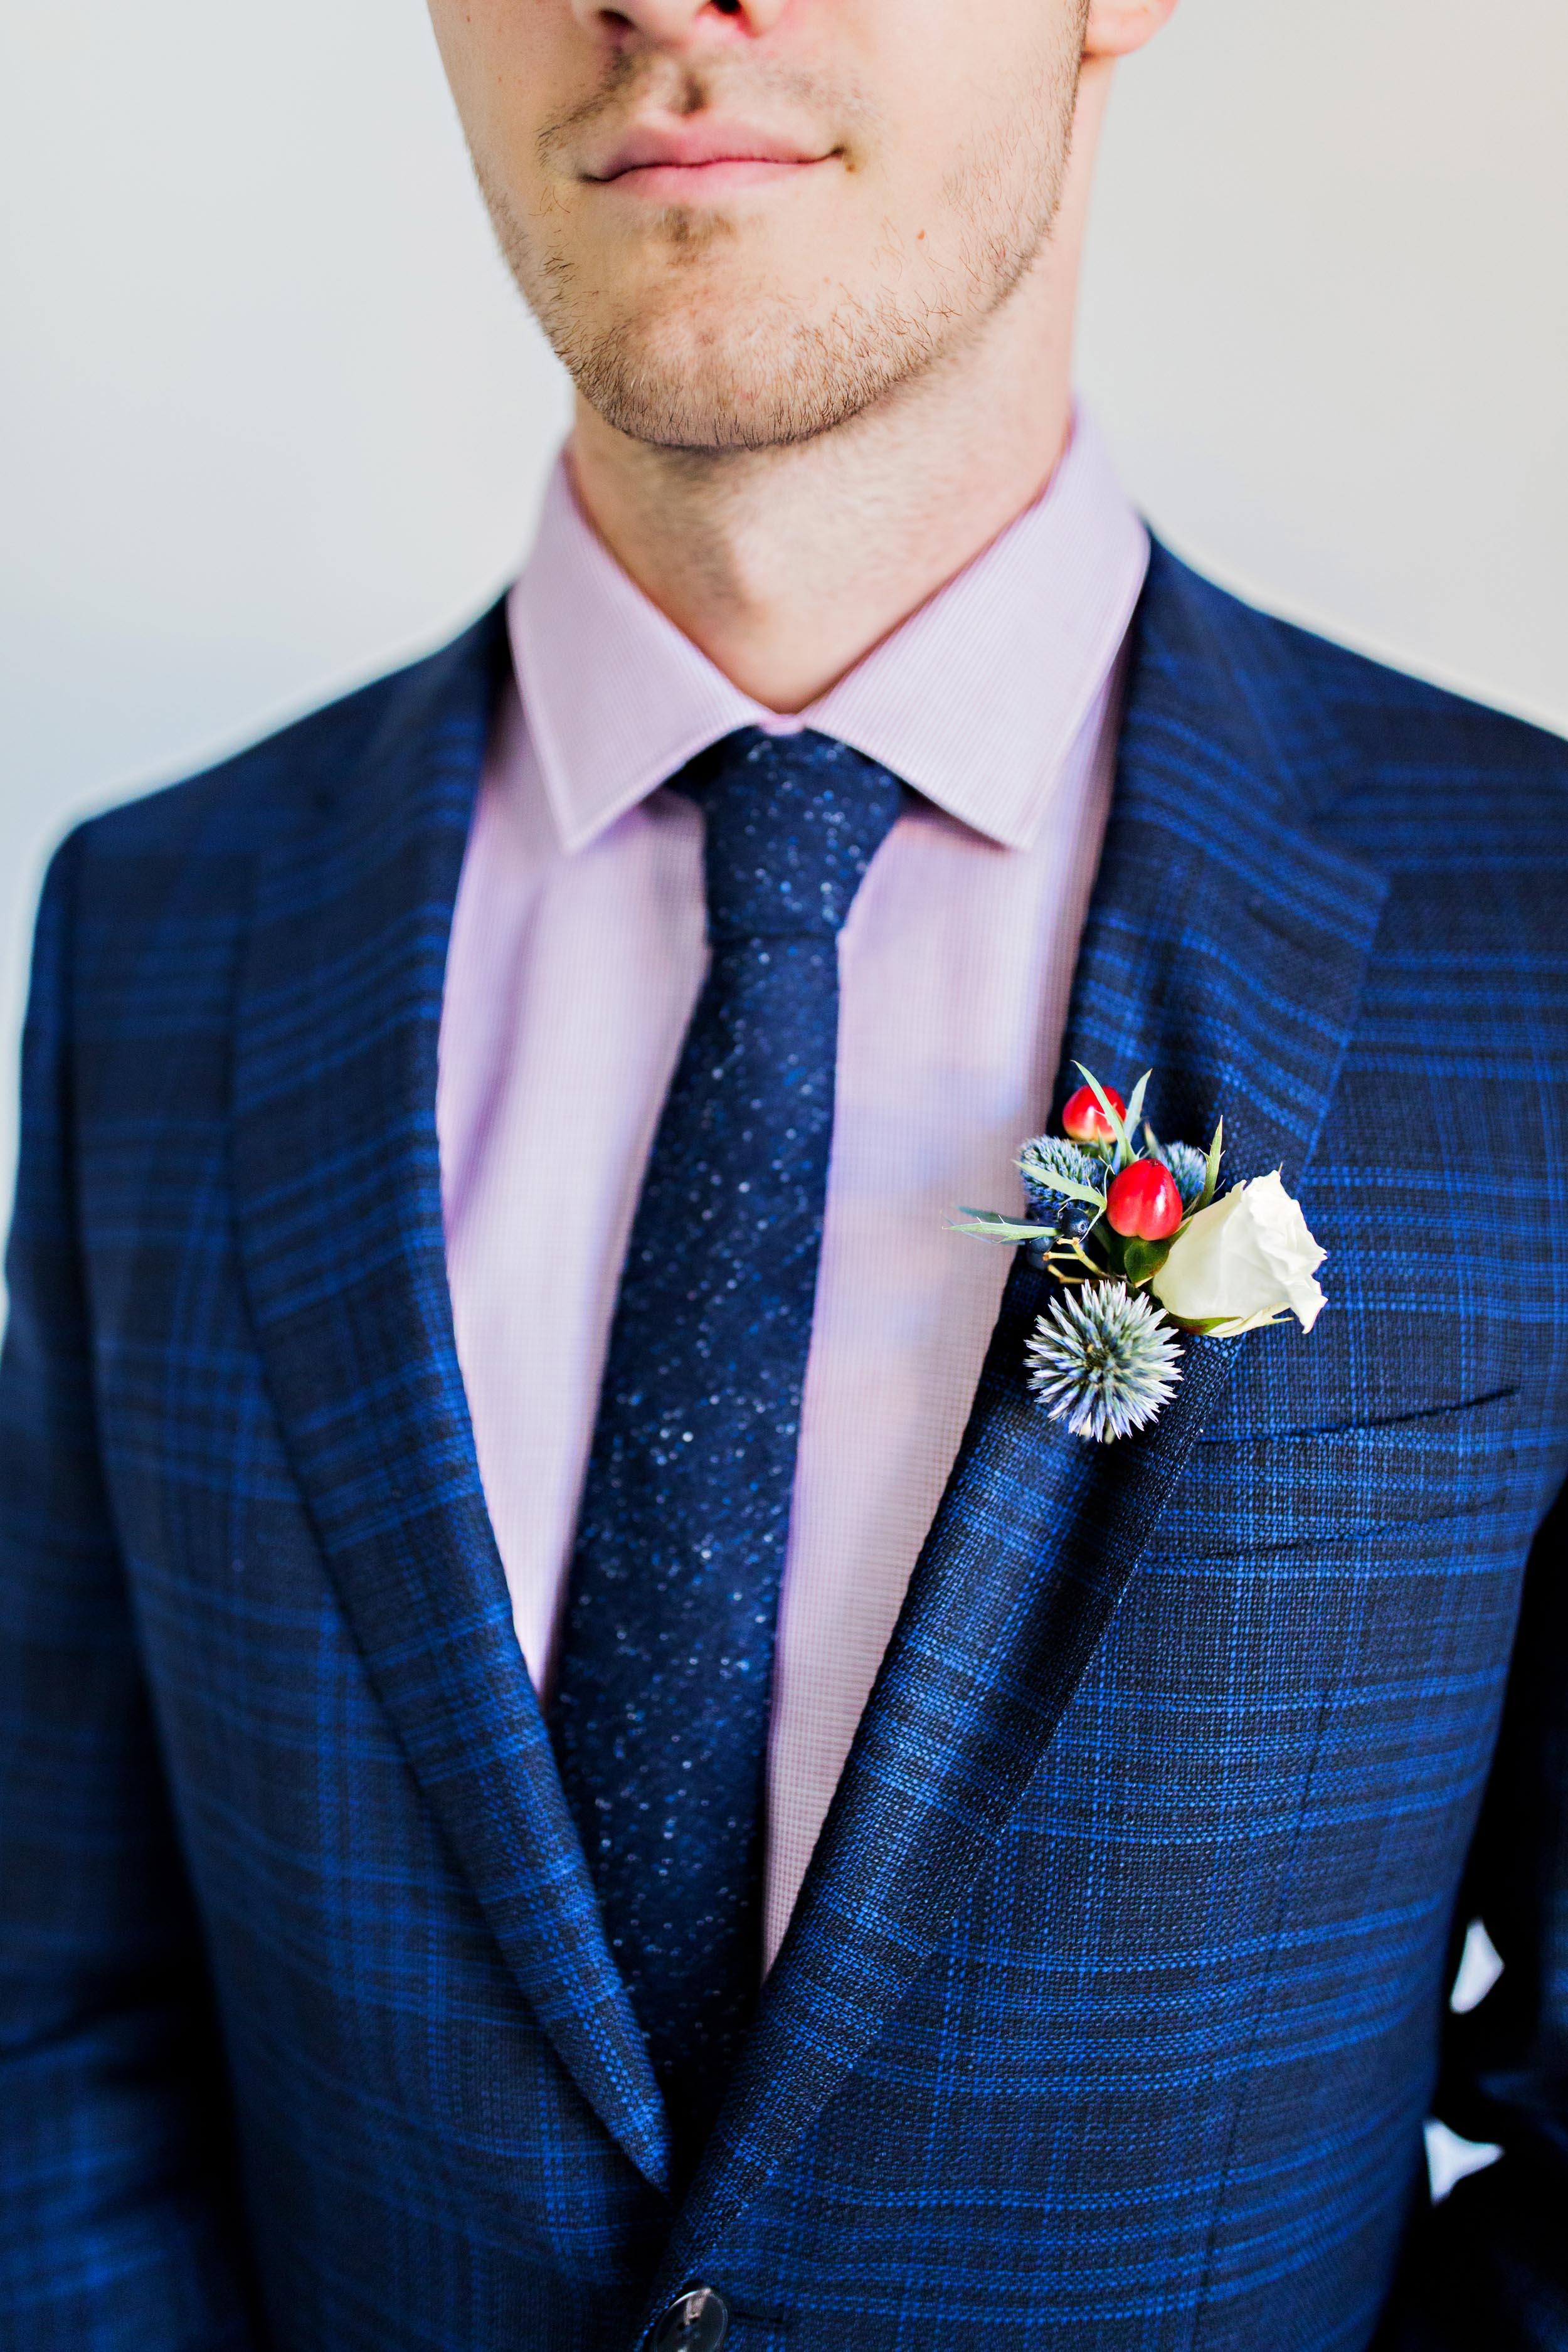 weddings-starsstripes-19.jpg